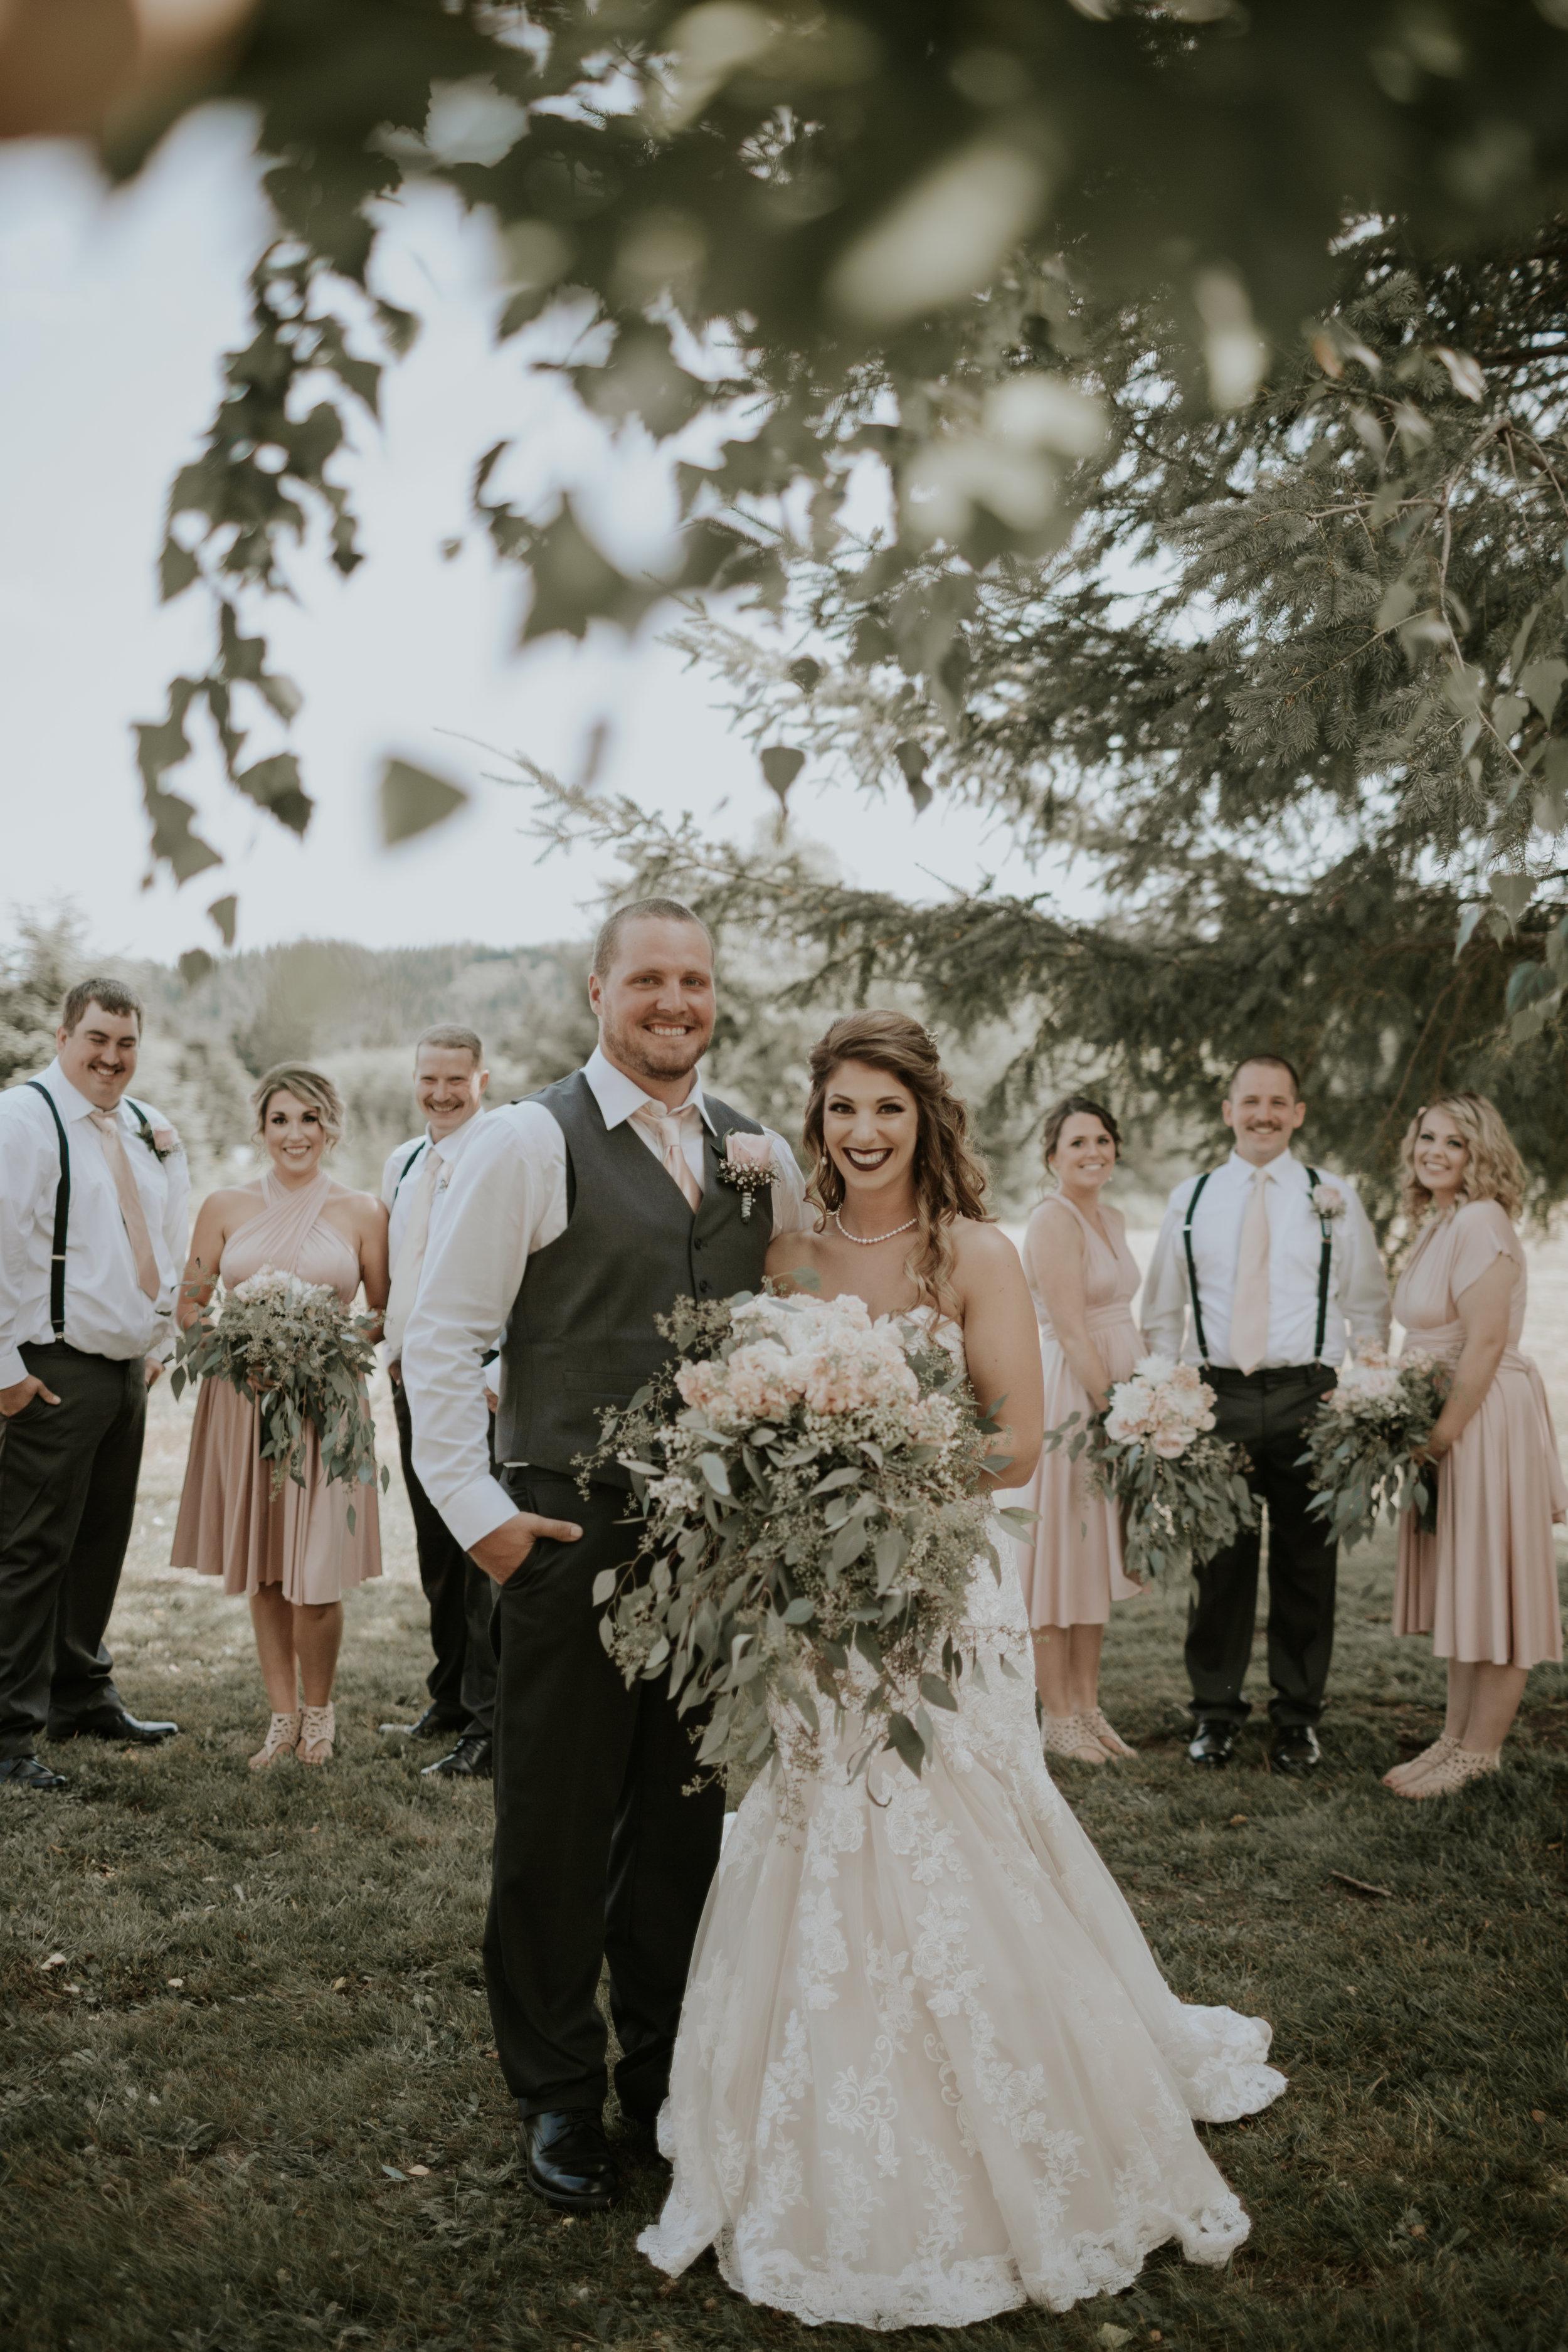 Olympic-Peninsula-Wedding-Photographer-PNW-Forks-Port-Angeles-Kayla-Dawn-Photography-engagement-Olympic-National-Park-16.jpg